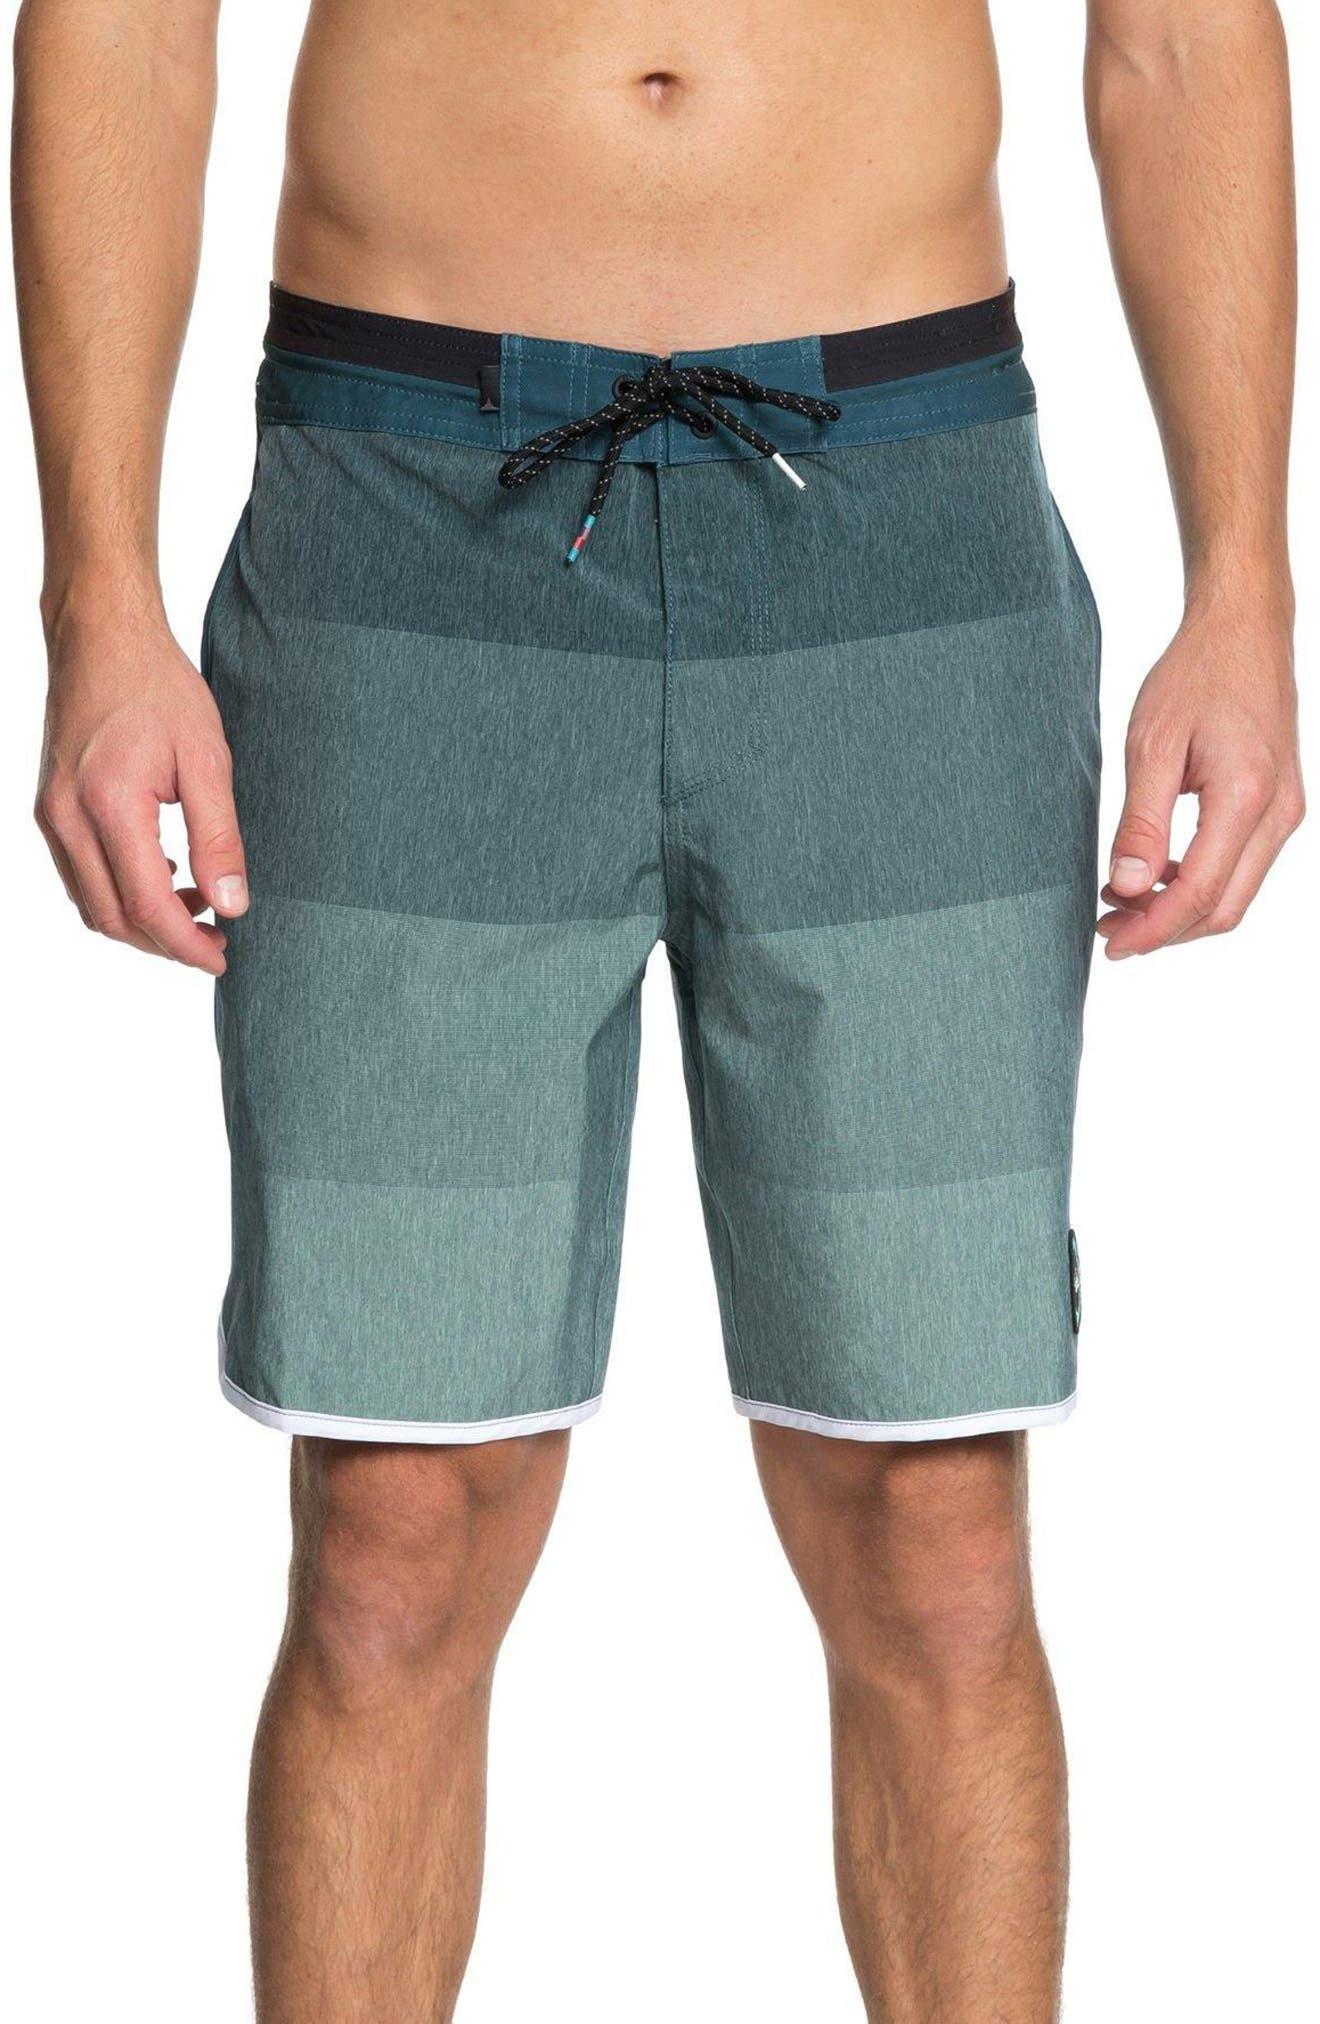 Vista Swim Shorts,                             Main thumbnail 1, color,                             Atlantic Deep